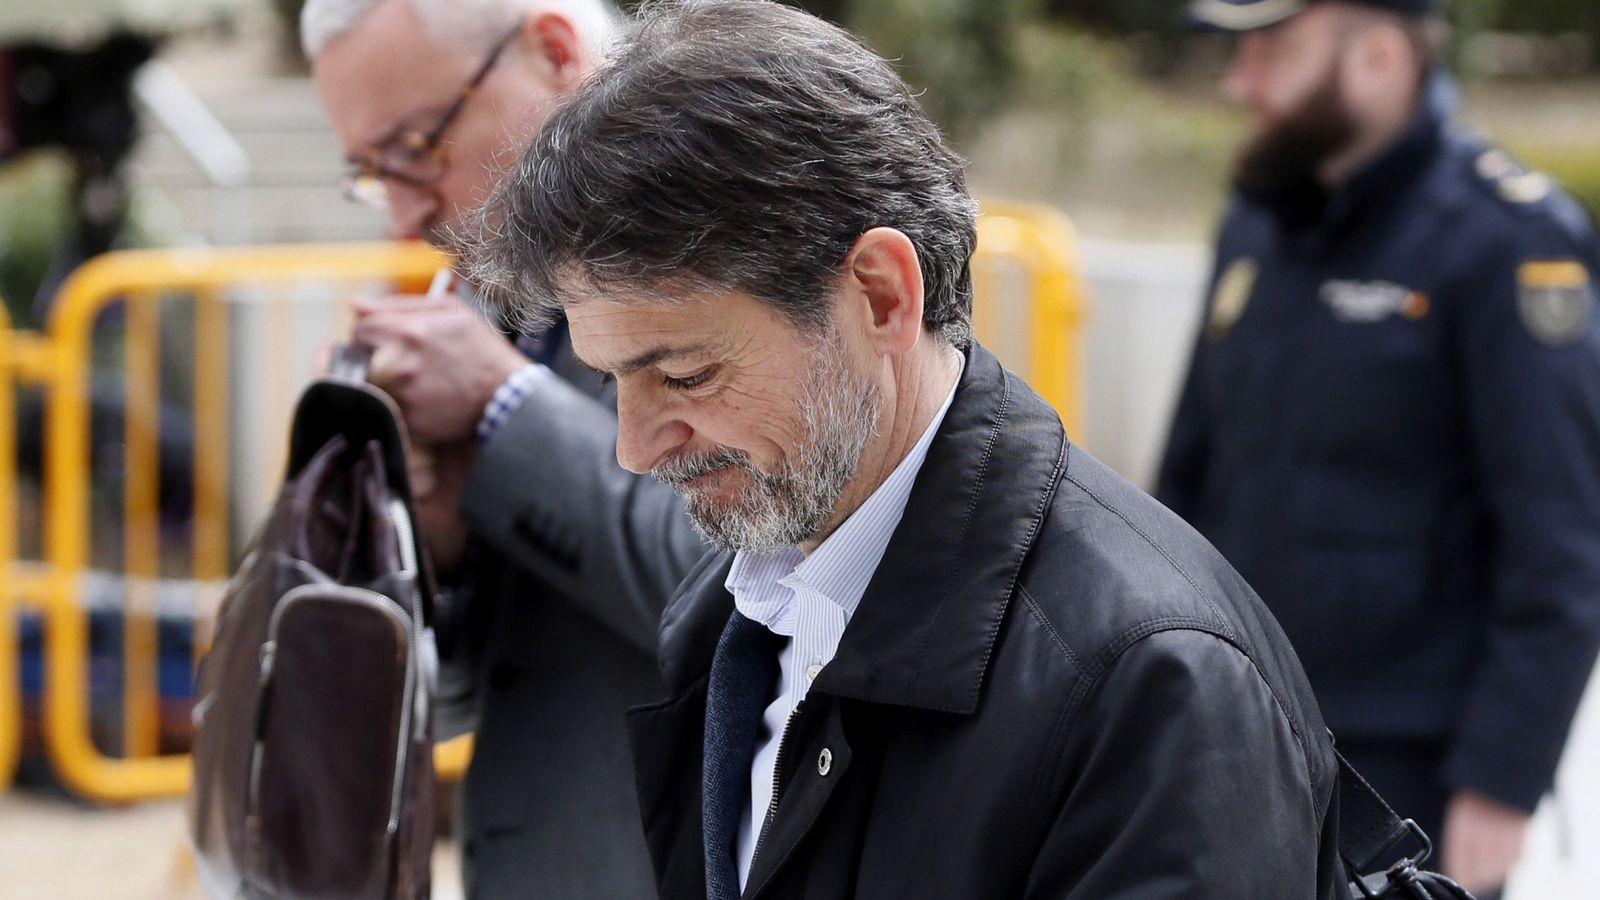 Foto: El exdiputado de CIU Oriol Pujol. (EFE)